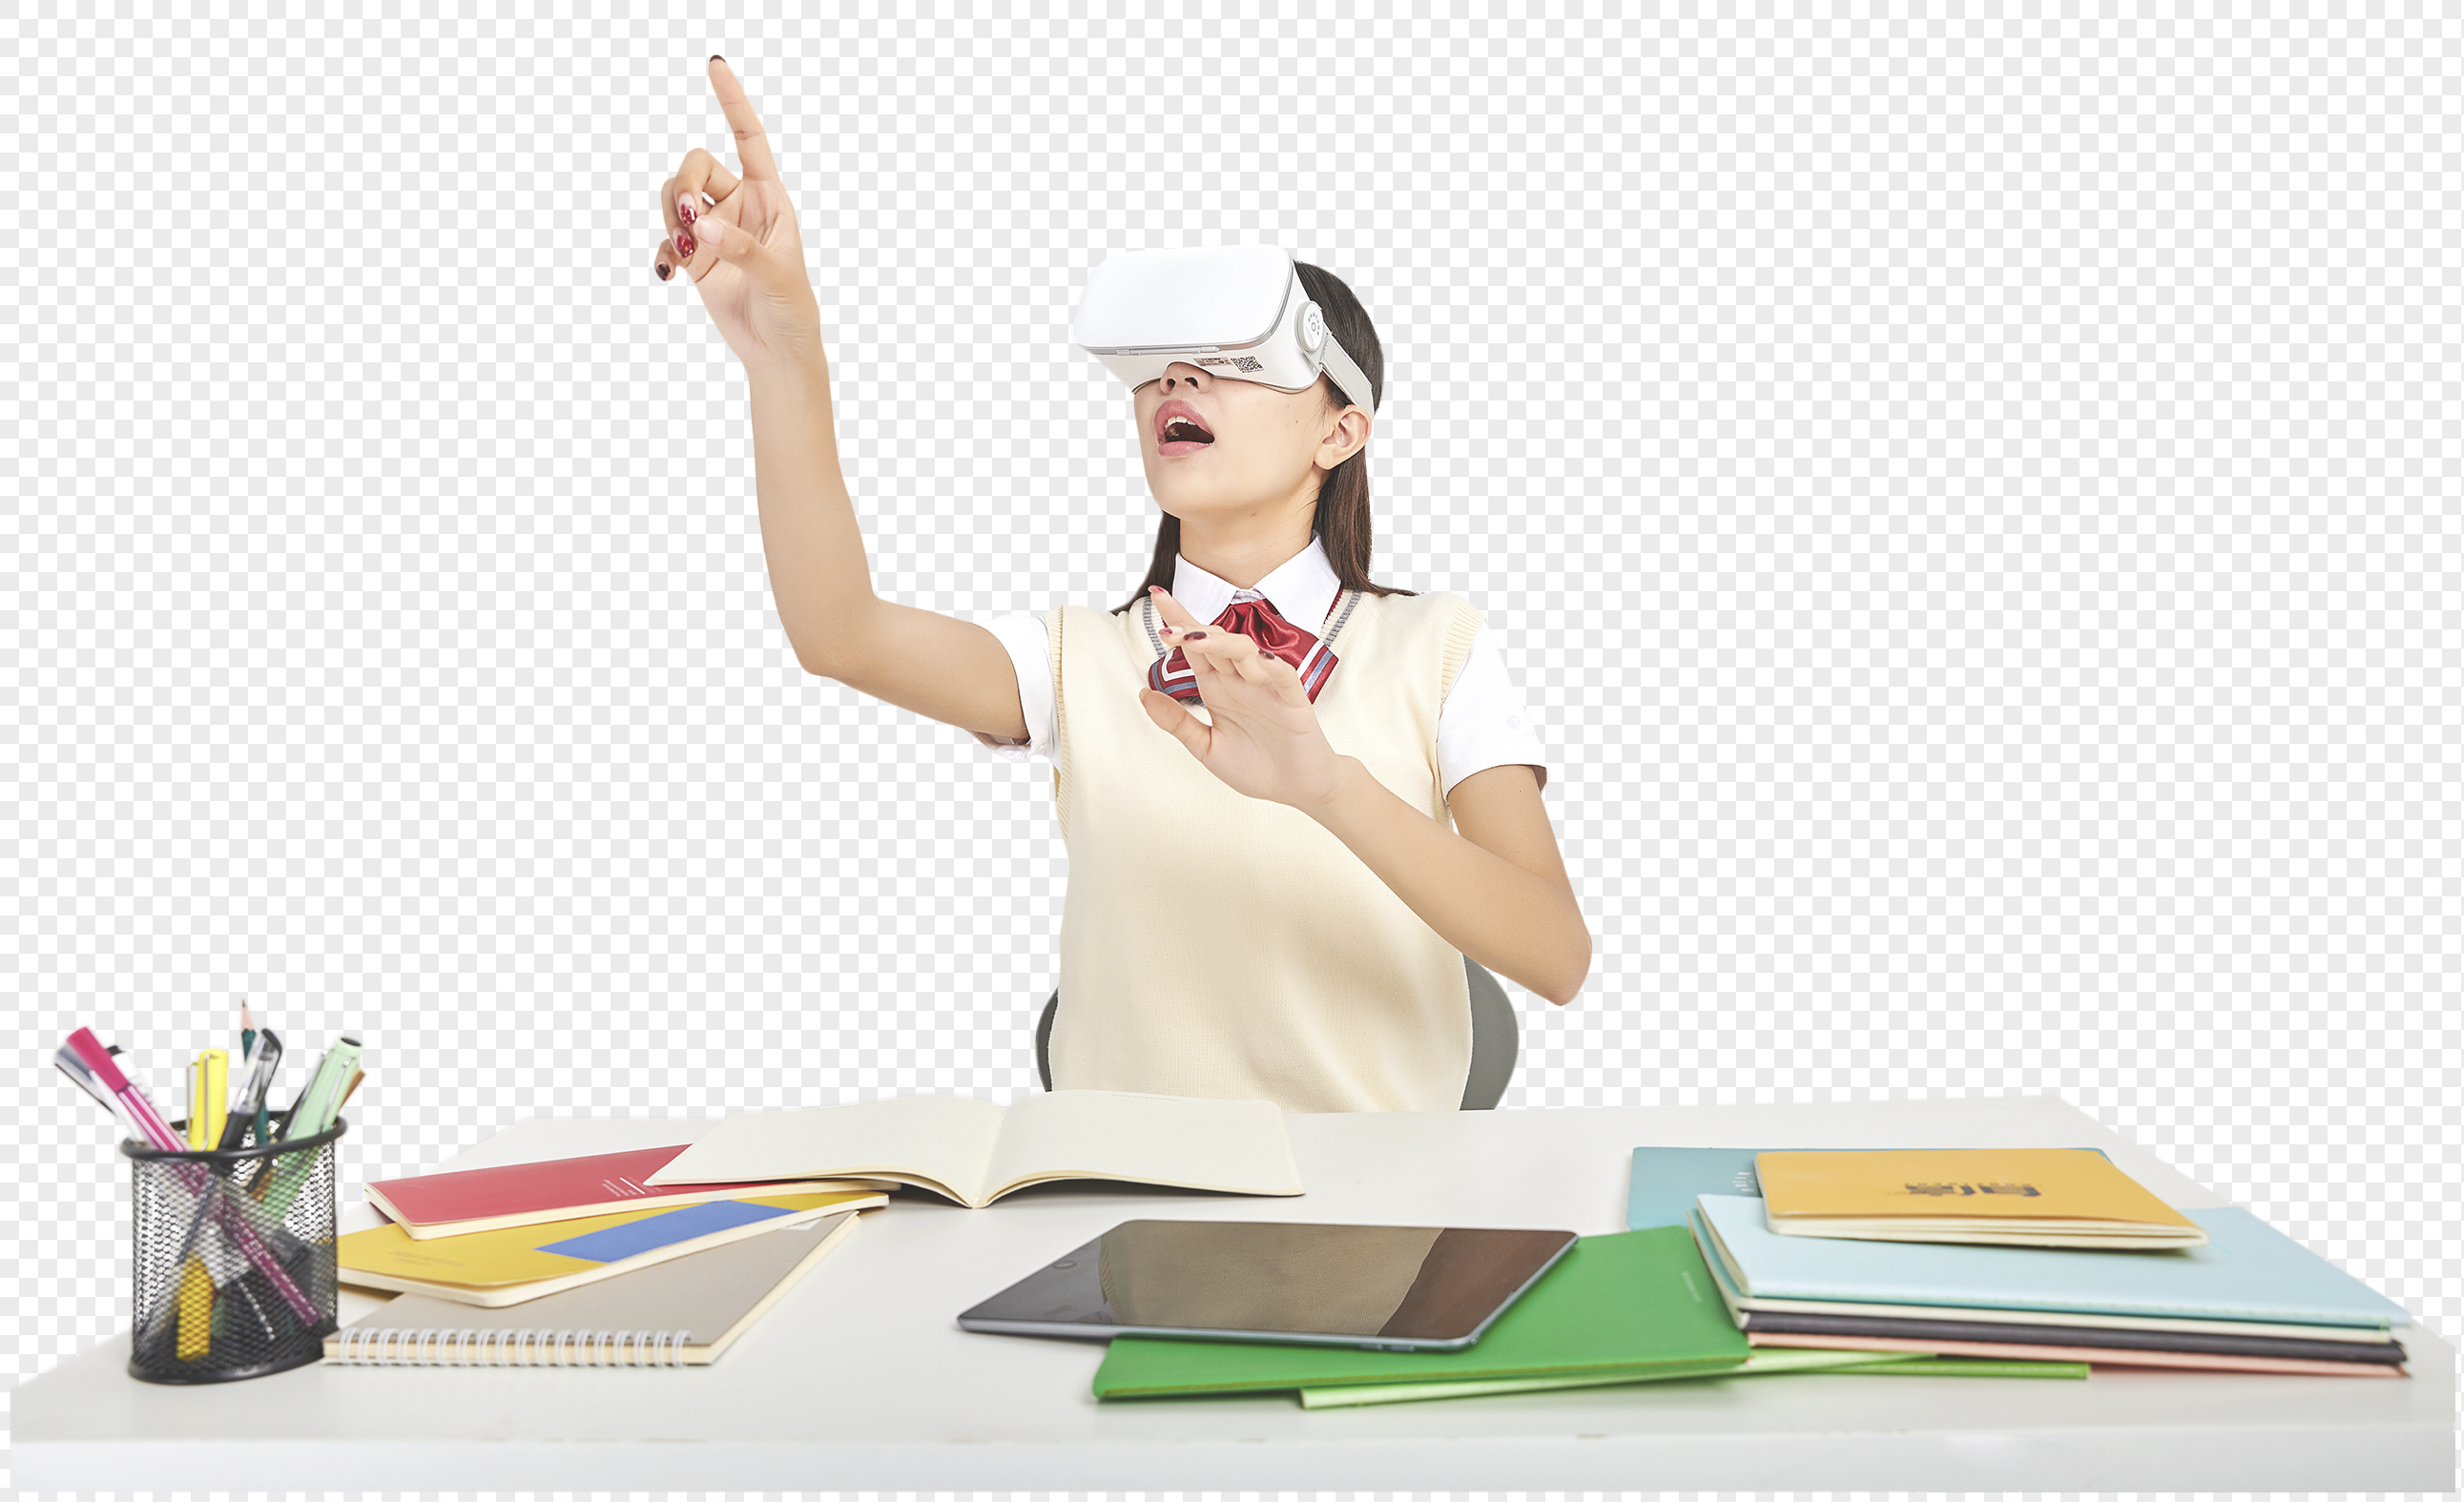 Virtual girl mobile free download.